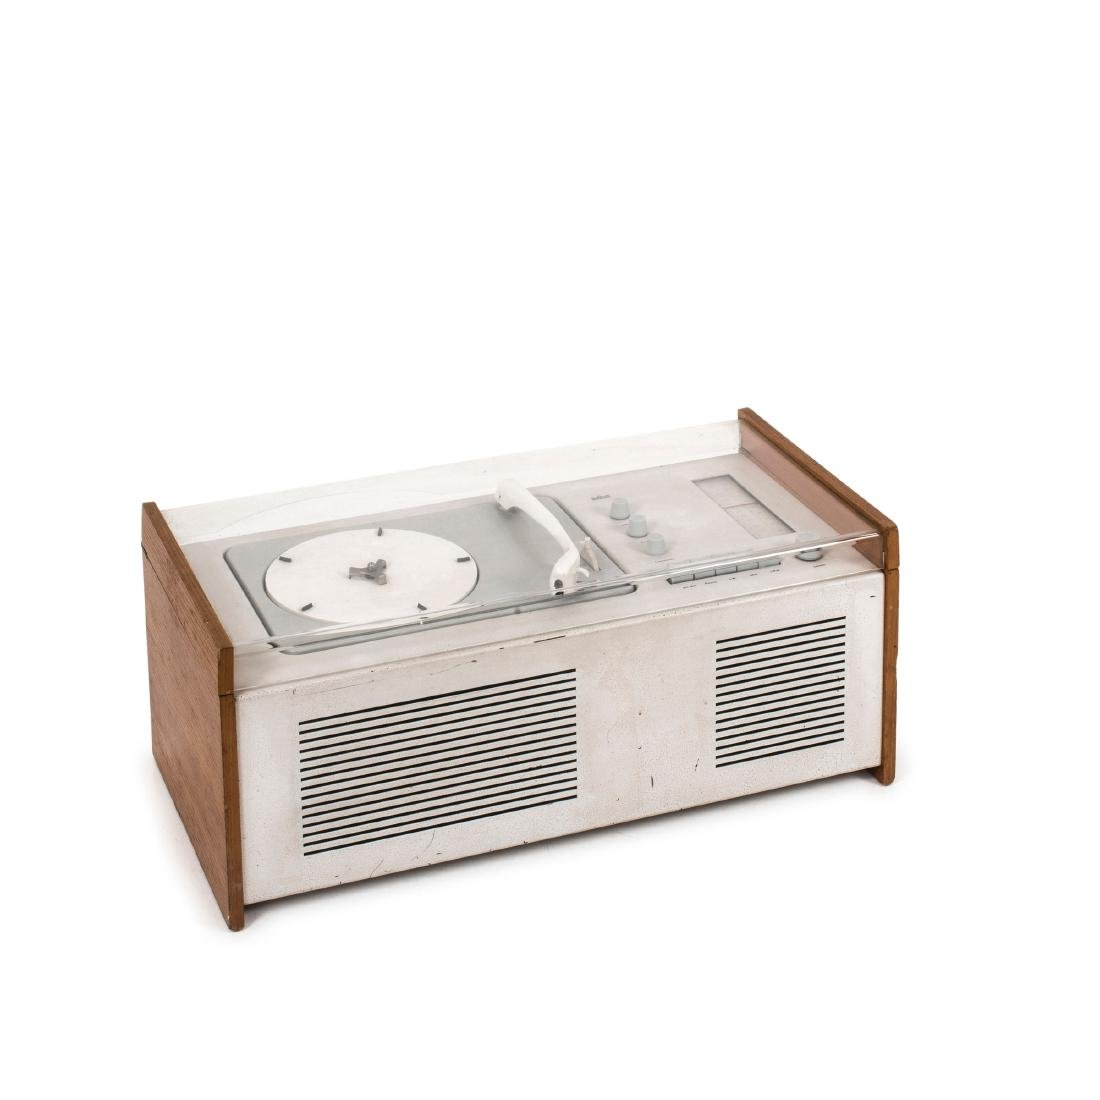 'SK 5' radio phono system, 1958